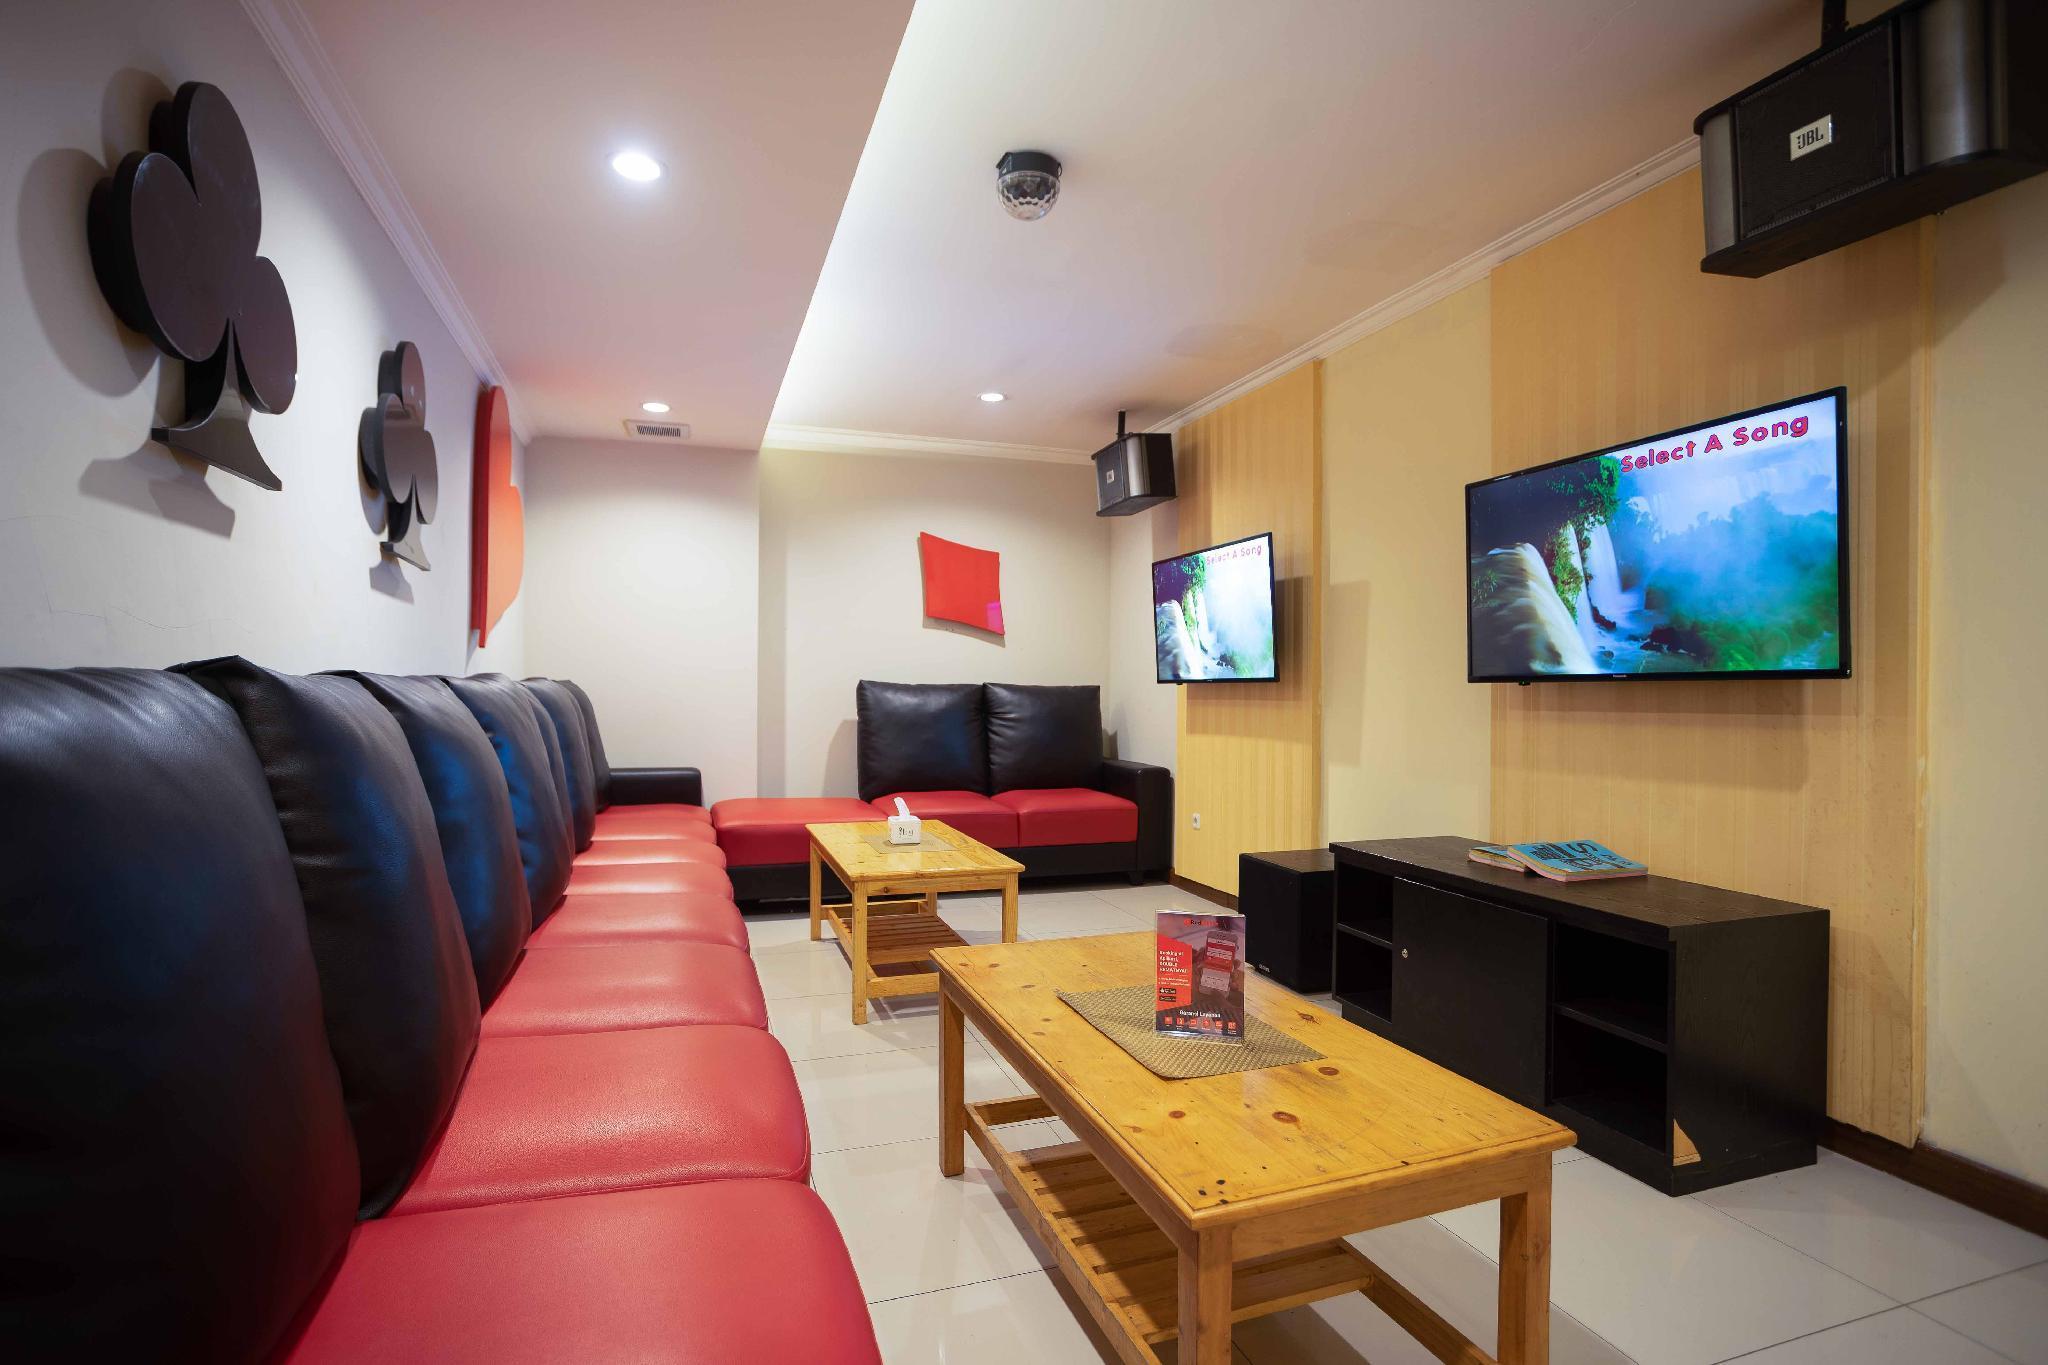 Price RedDoorz Premium near Kawasan Industri Cikarang